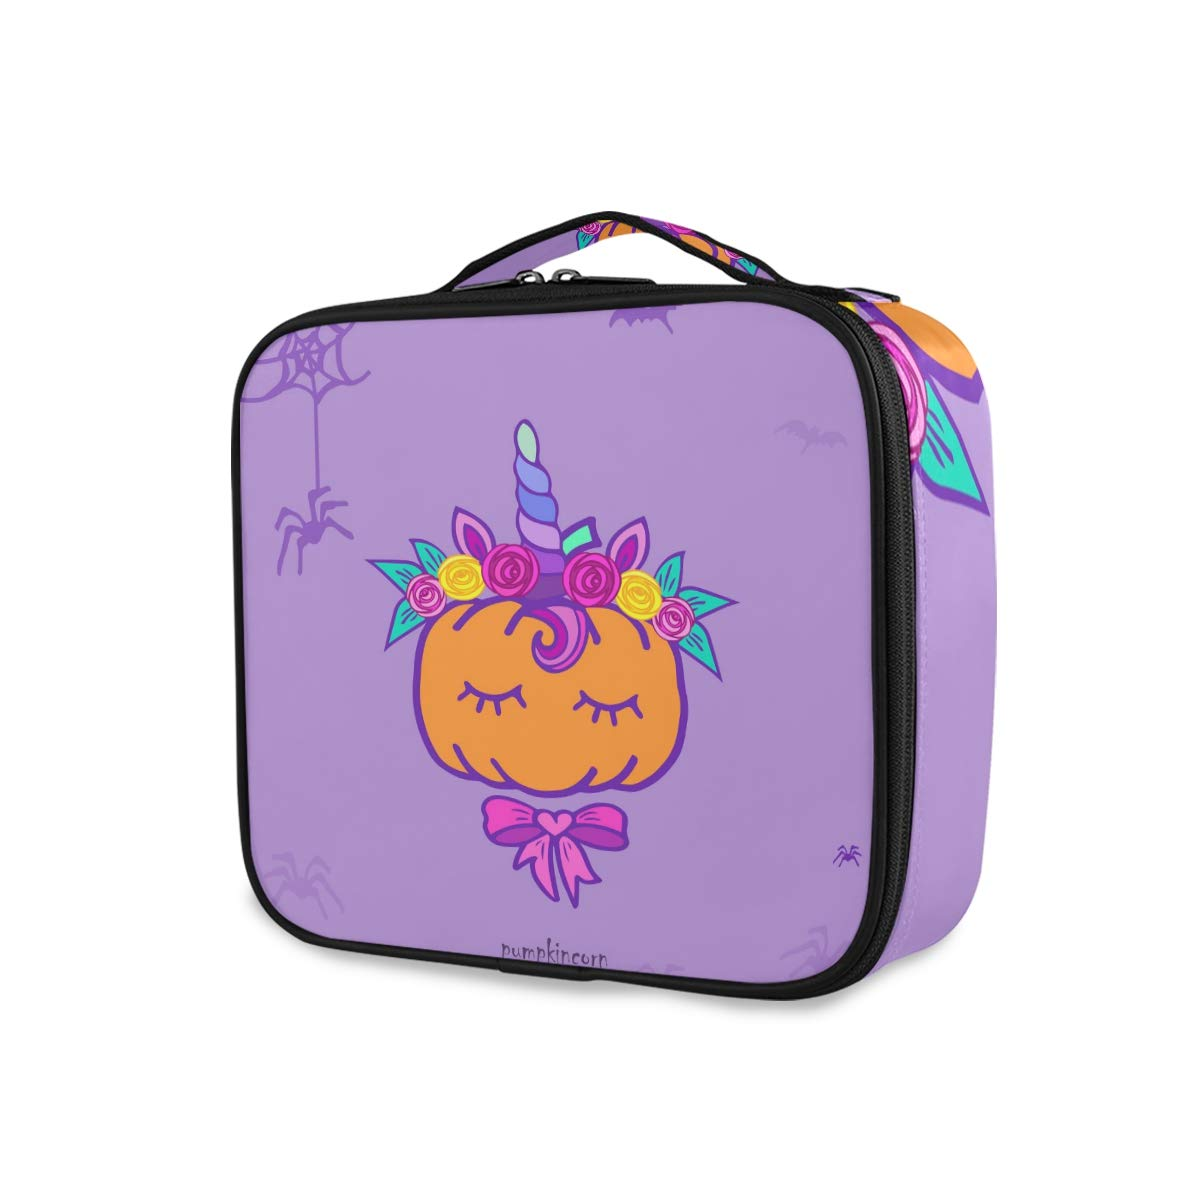 Travel Makeup Max 75% OFF Case Pumpkin Financial sales sale Unicorn Bag Cosmetic Portable